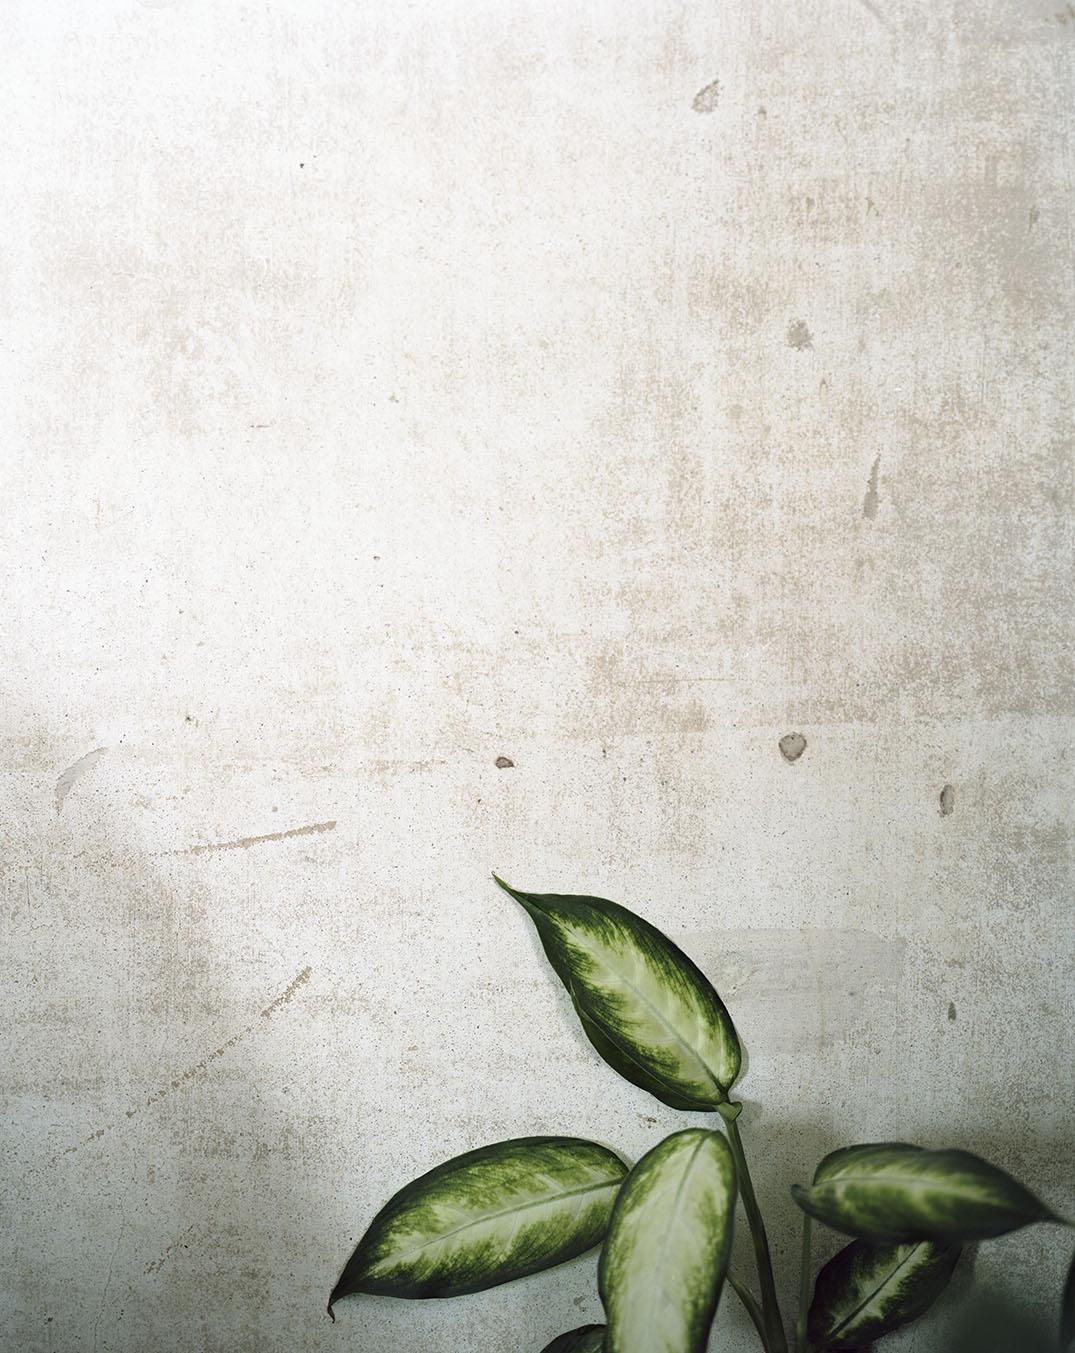 plant-onwall-work.jpg